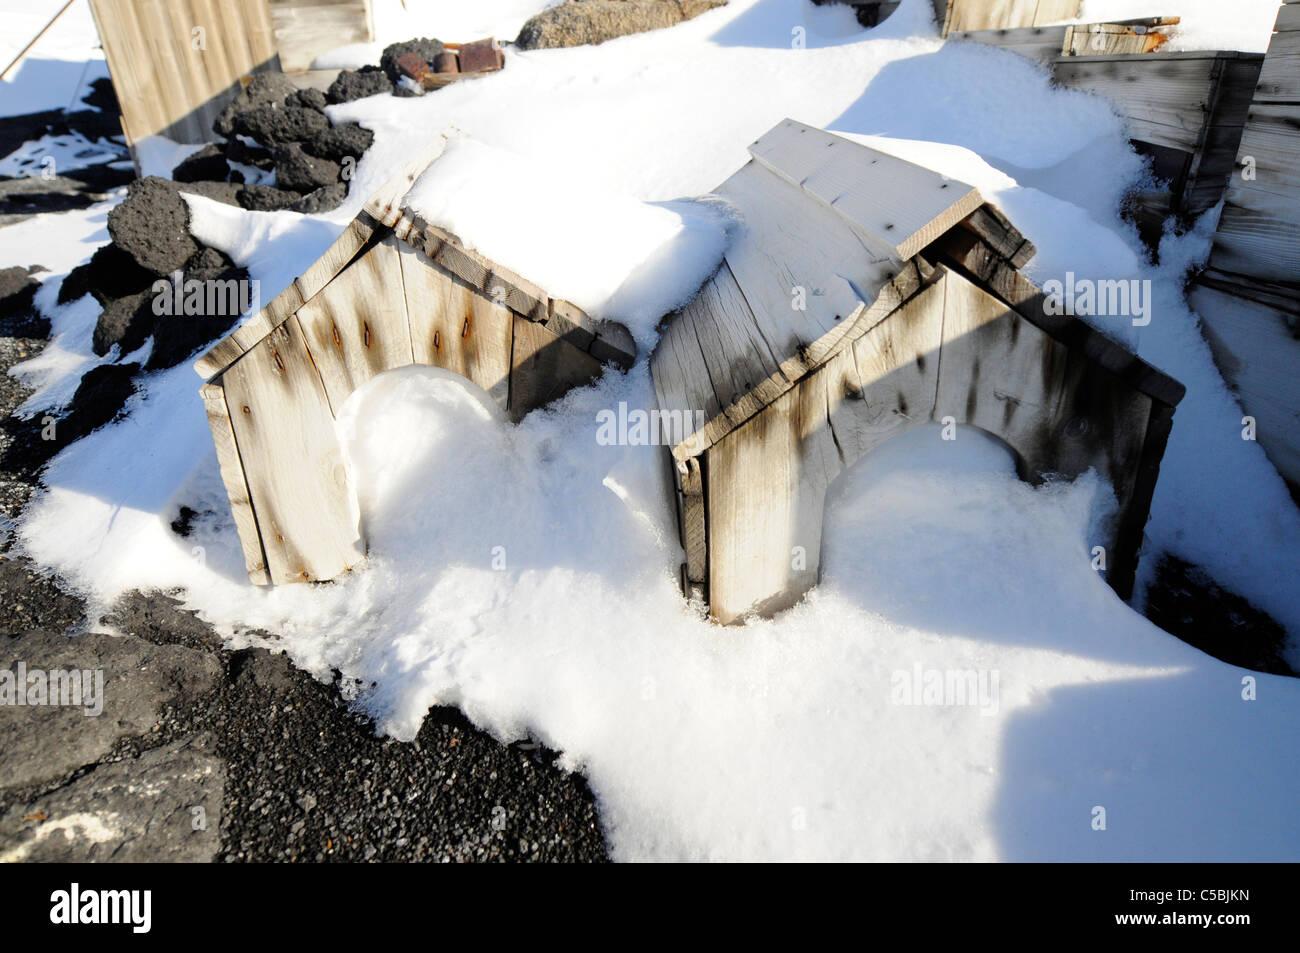 Historic artifact kennels at Shackleton's Hut Cape Royds Antarctica - Stock Image